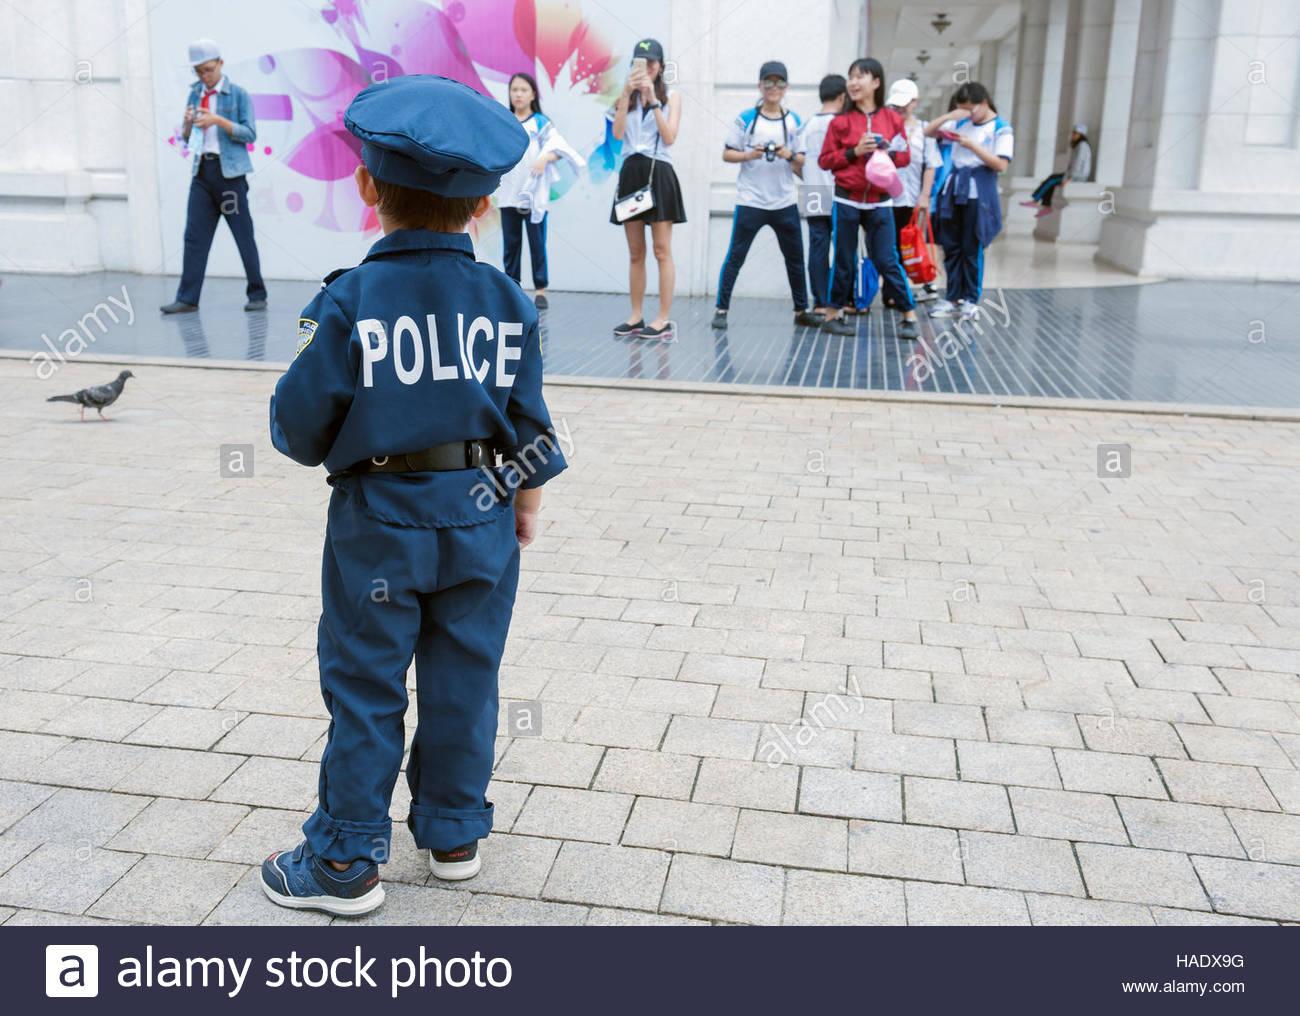 ho-chi-minh-city-hcmc-saigon-vietnam-a-toddler-wearing-a-police-uniform-HADX9G.jpg